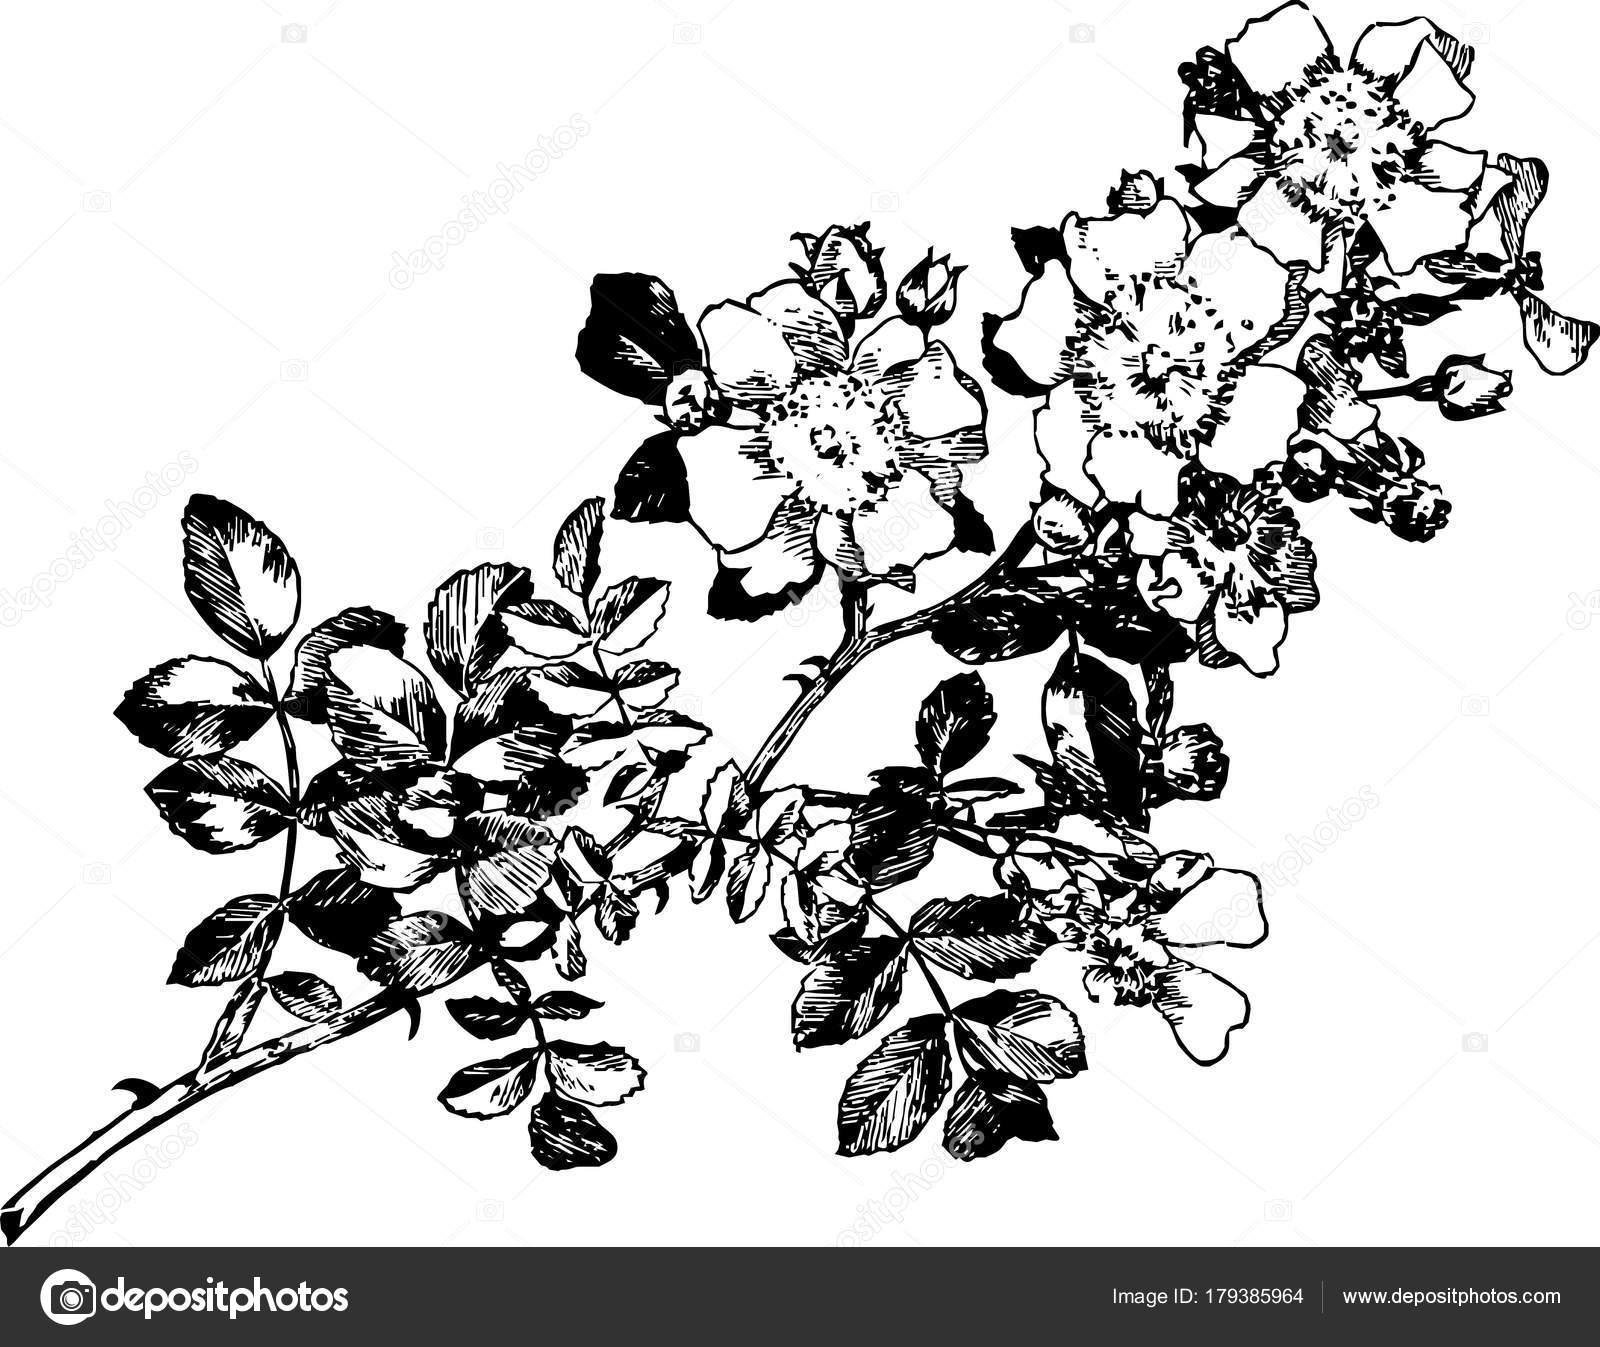 wild rose schwarz wei stockvektor hav4ik79 179385964. Black Bedroom Furniture Sets. Home Design Ideas